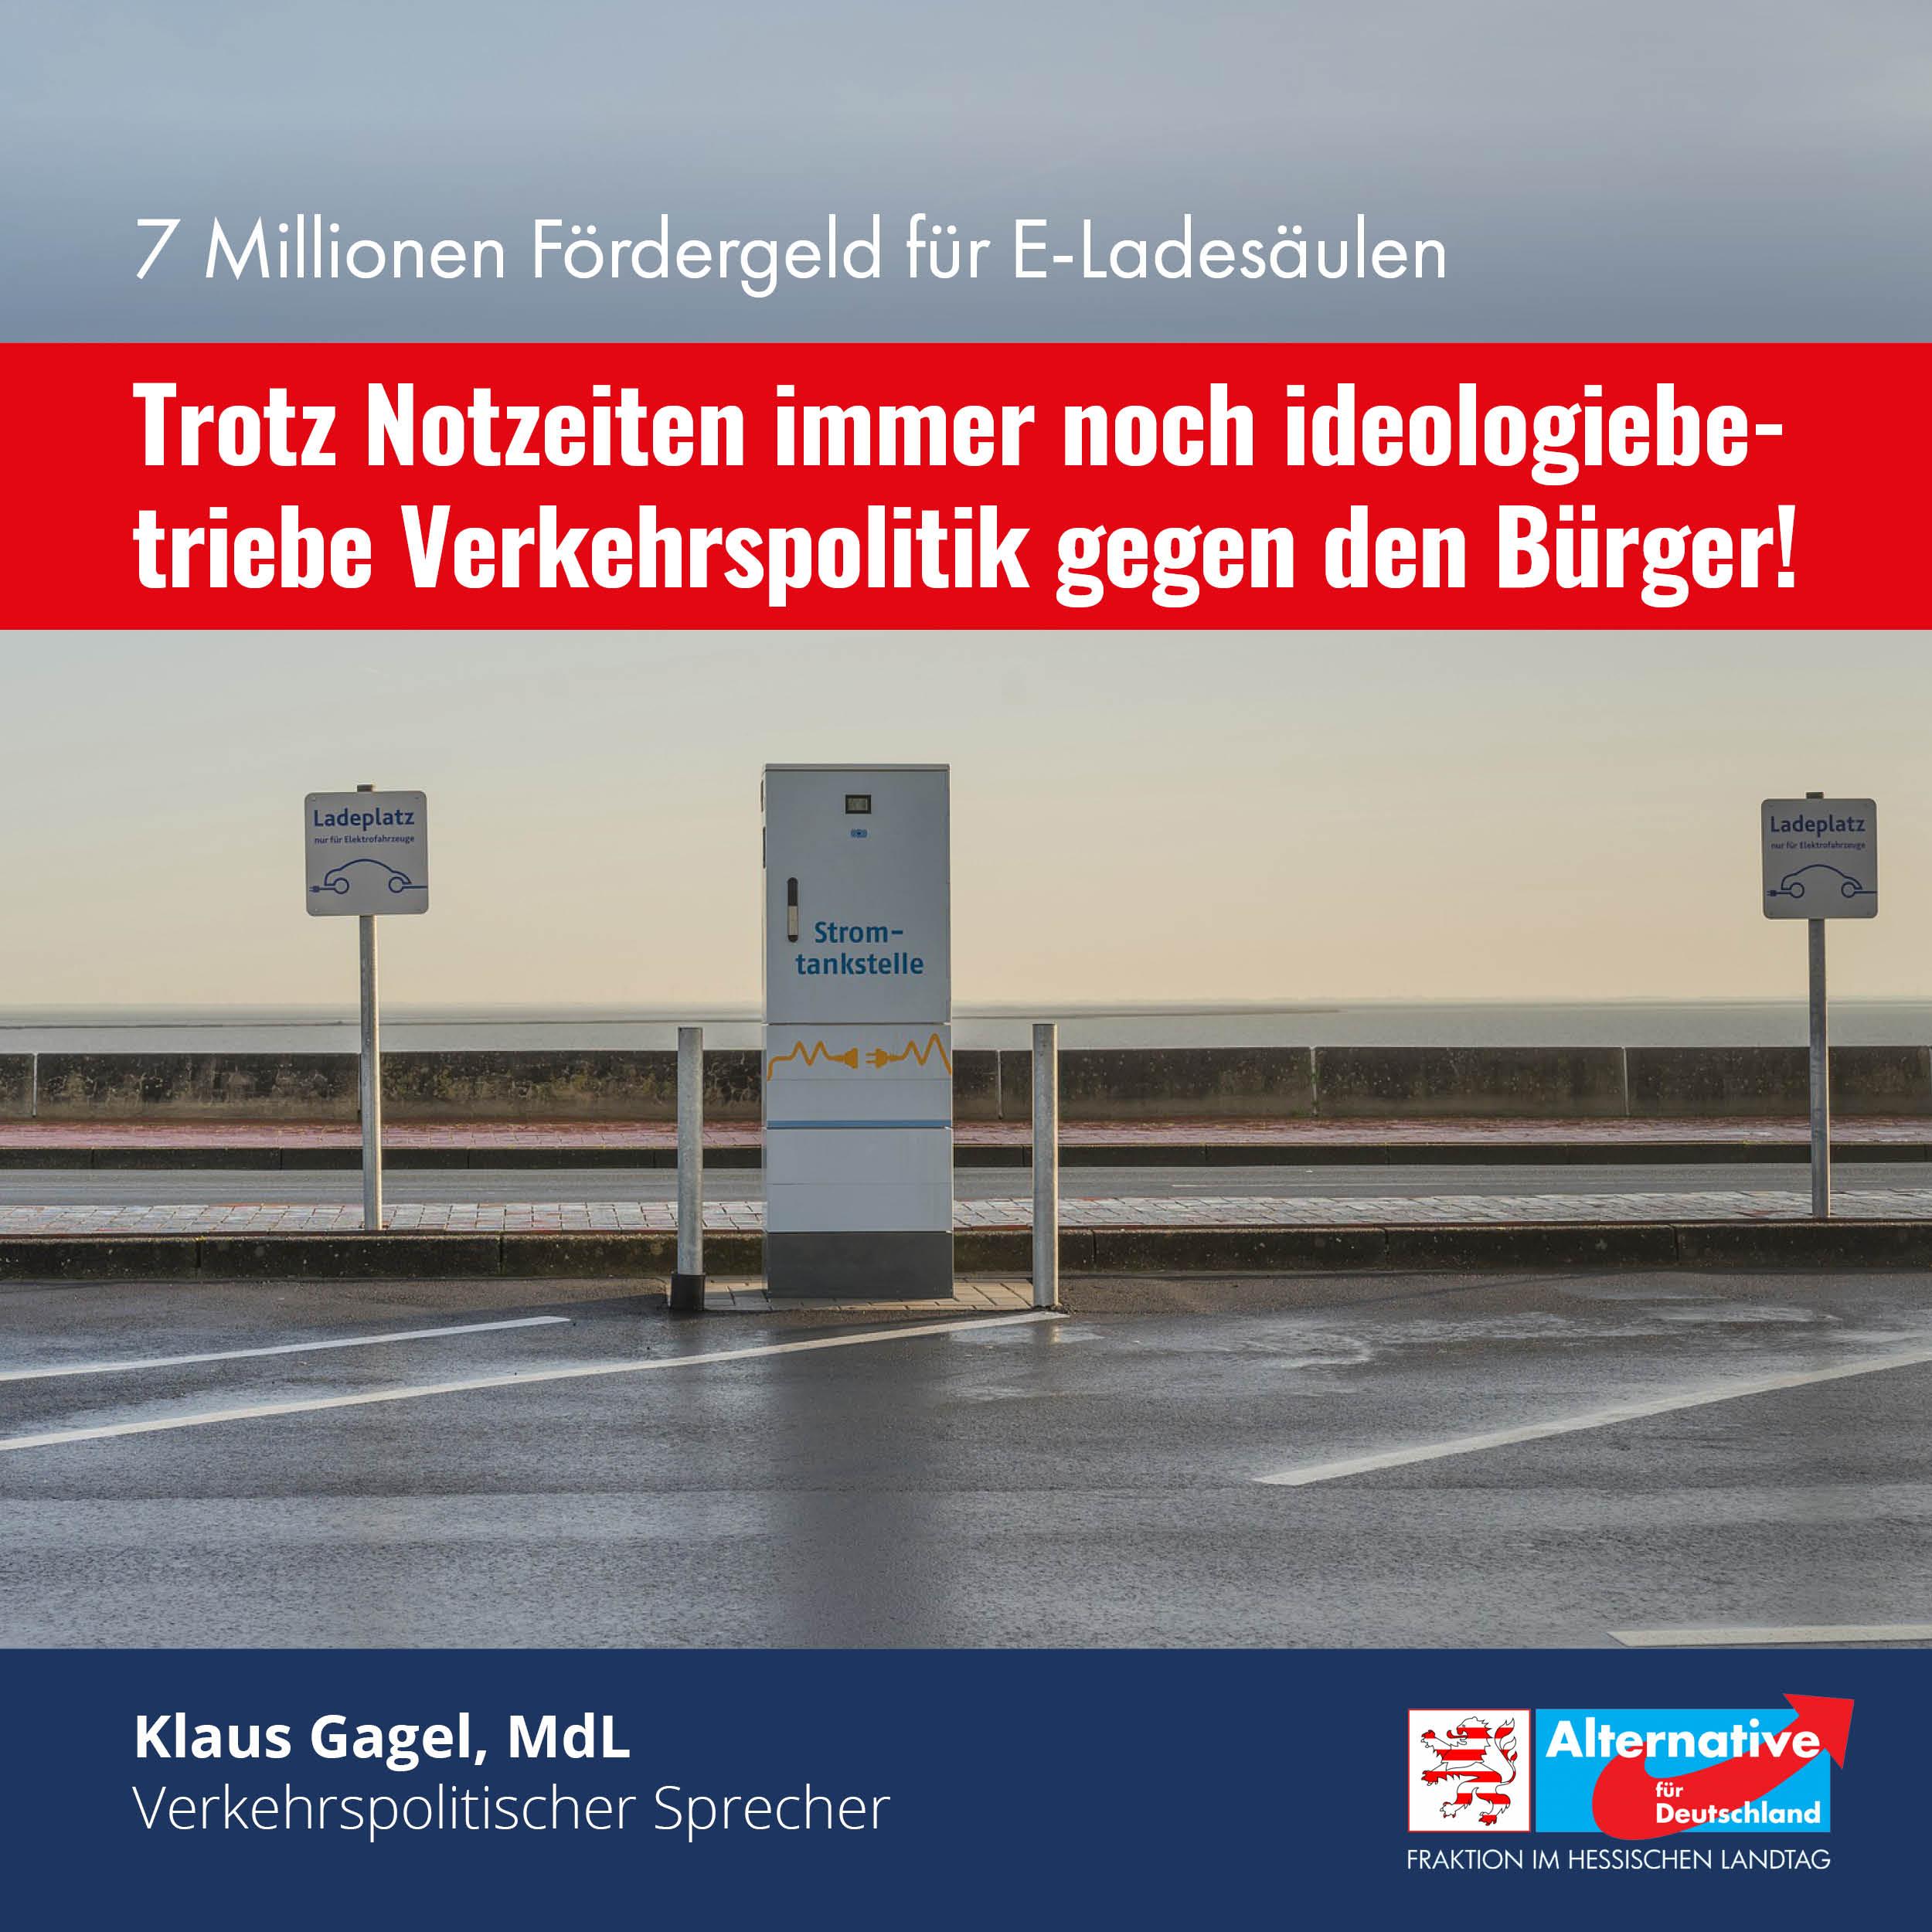 ideologiebetriebene Verkehrspolitik